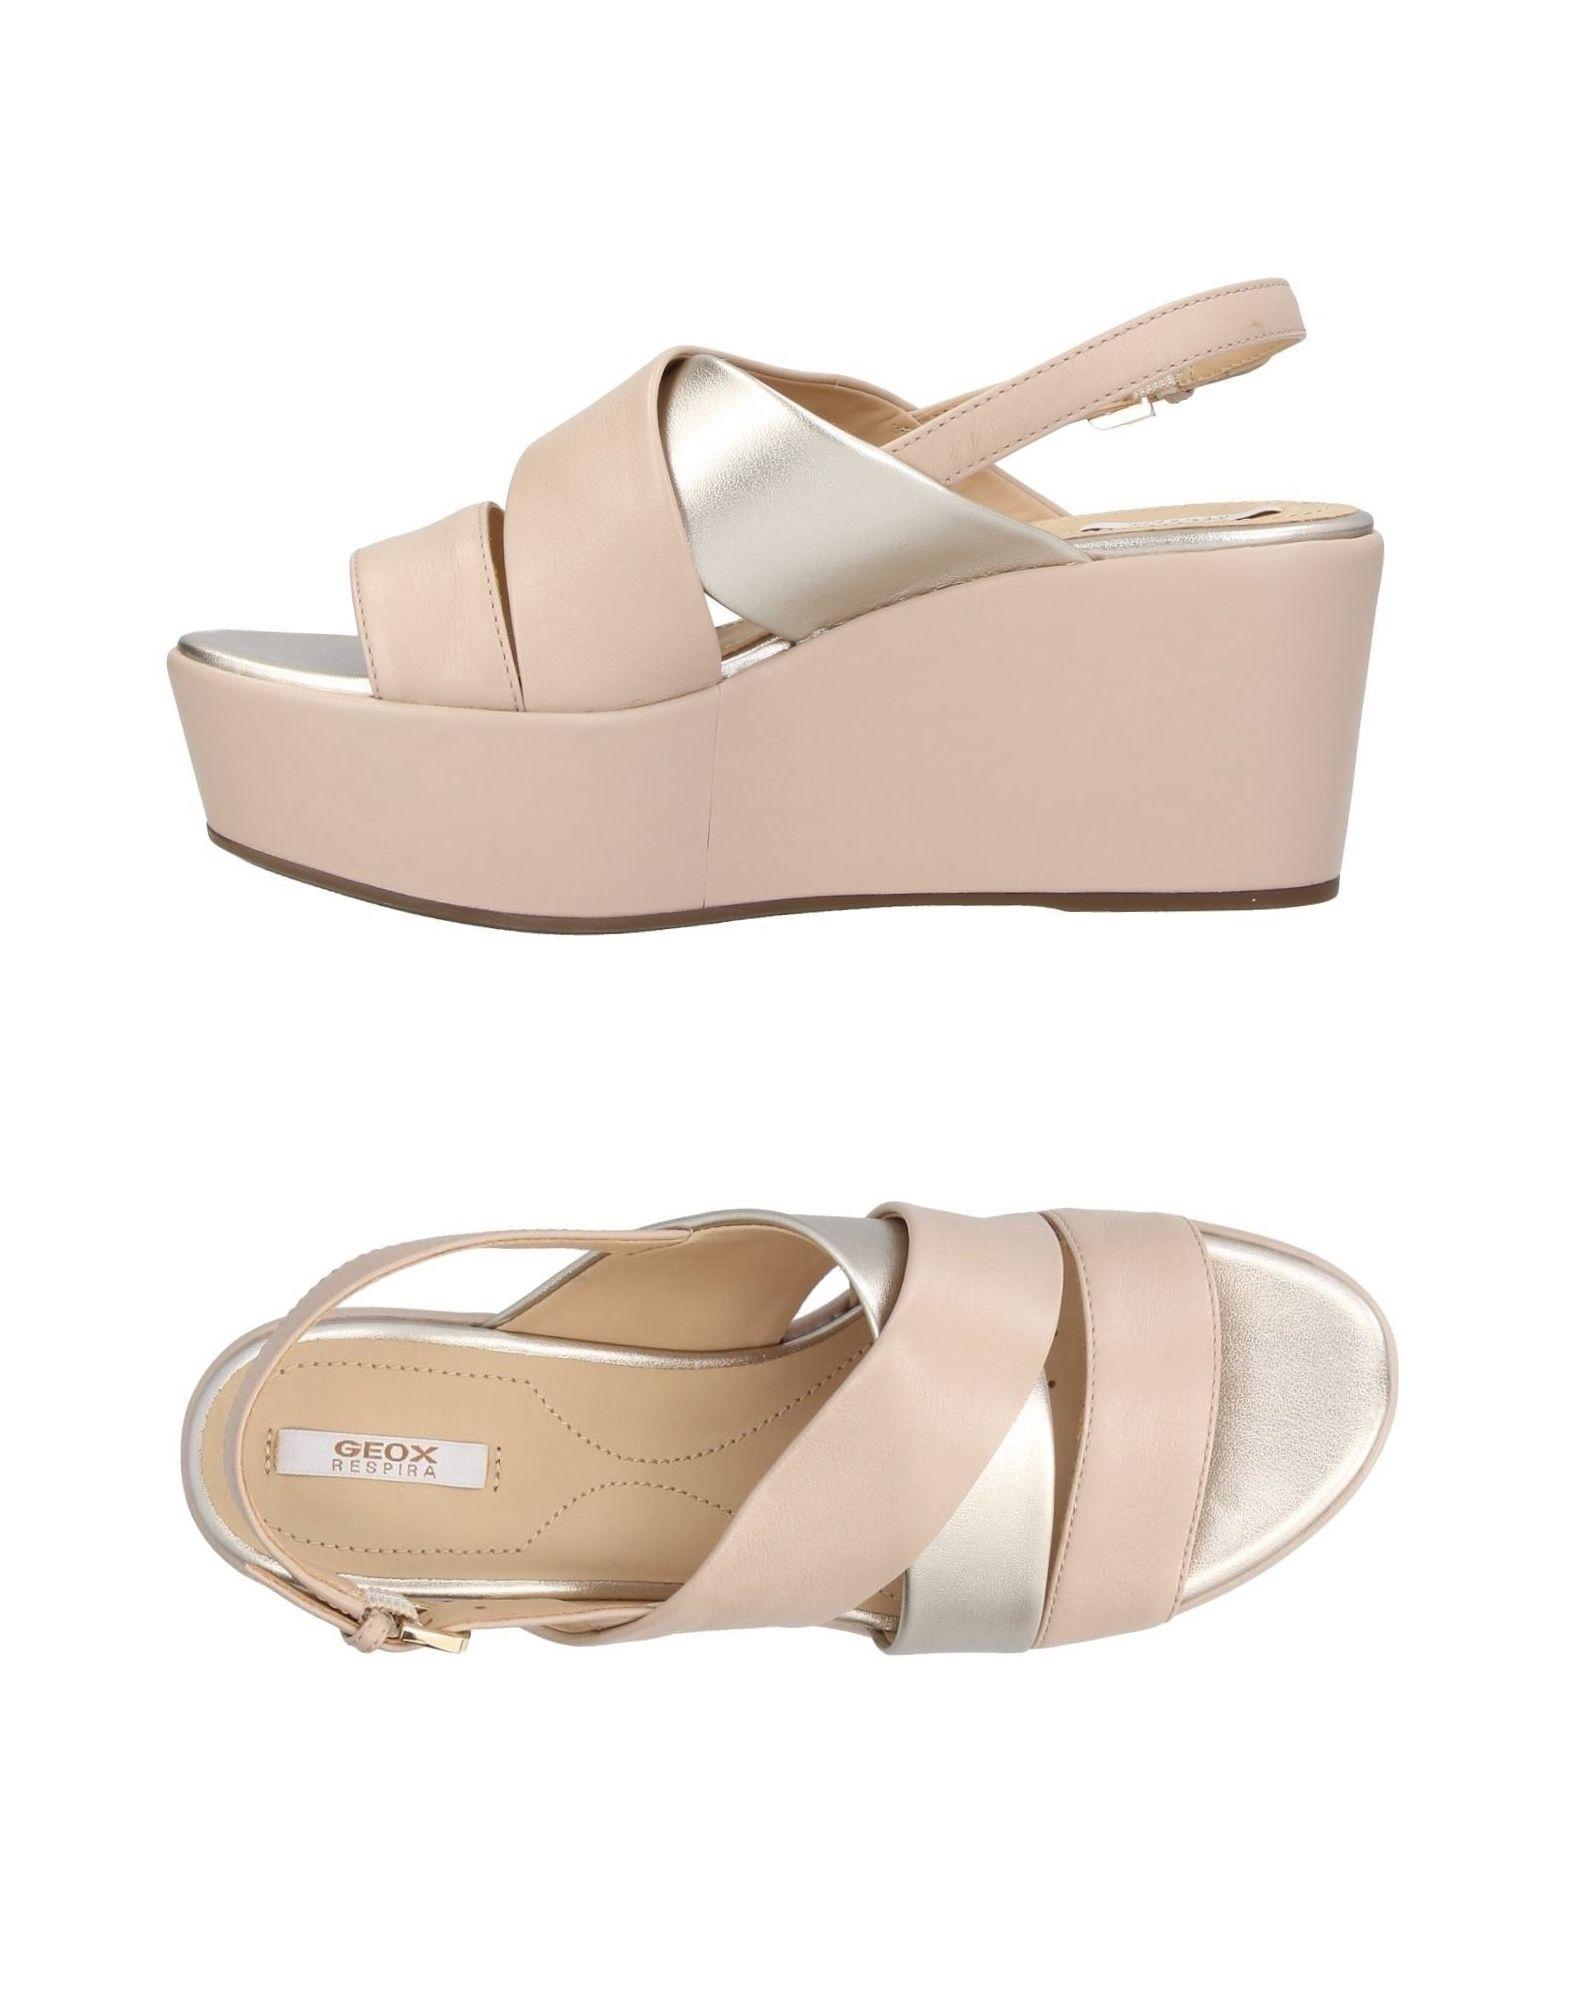 Geox Sandalen Damen  11414036TI Gute Qualität beliebte Schuhe